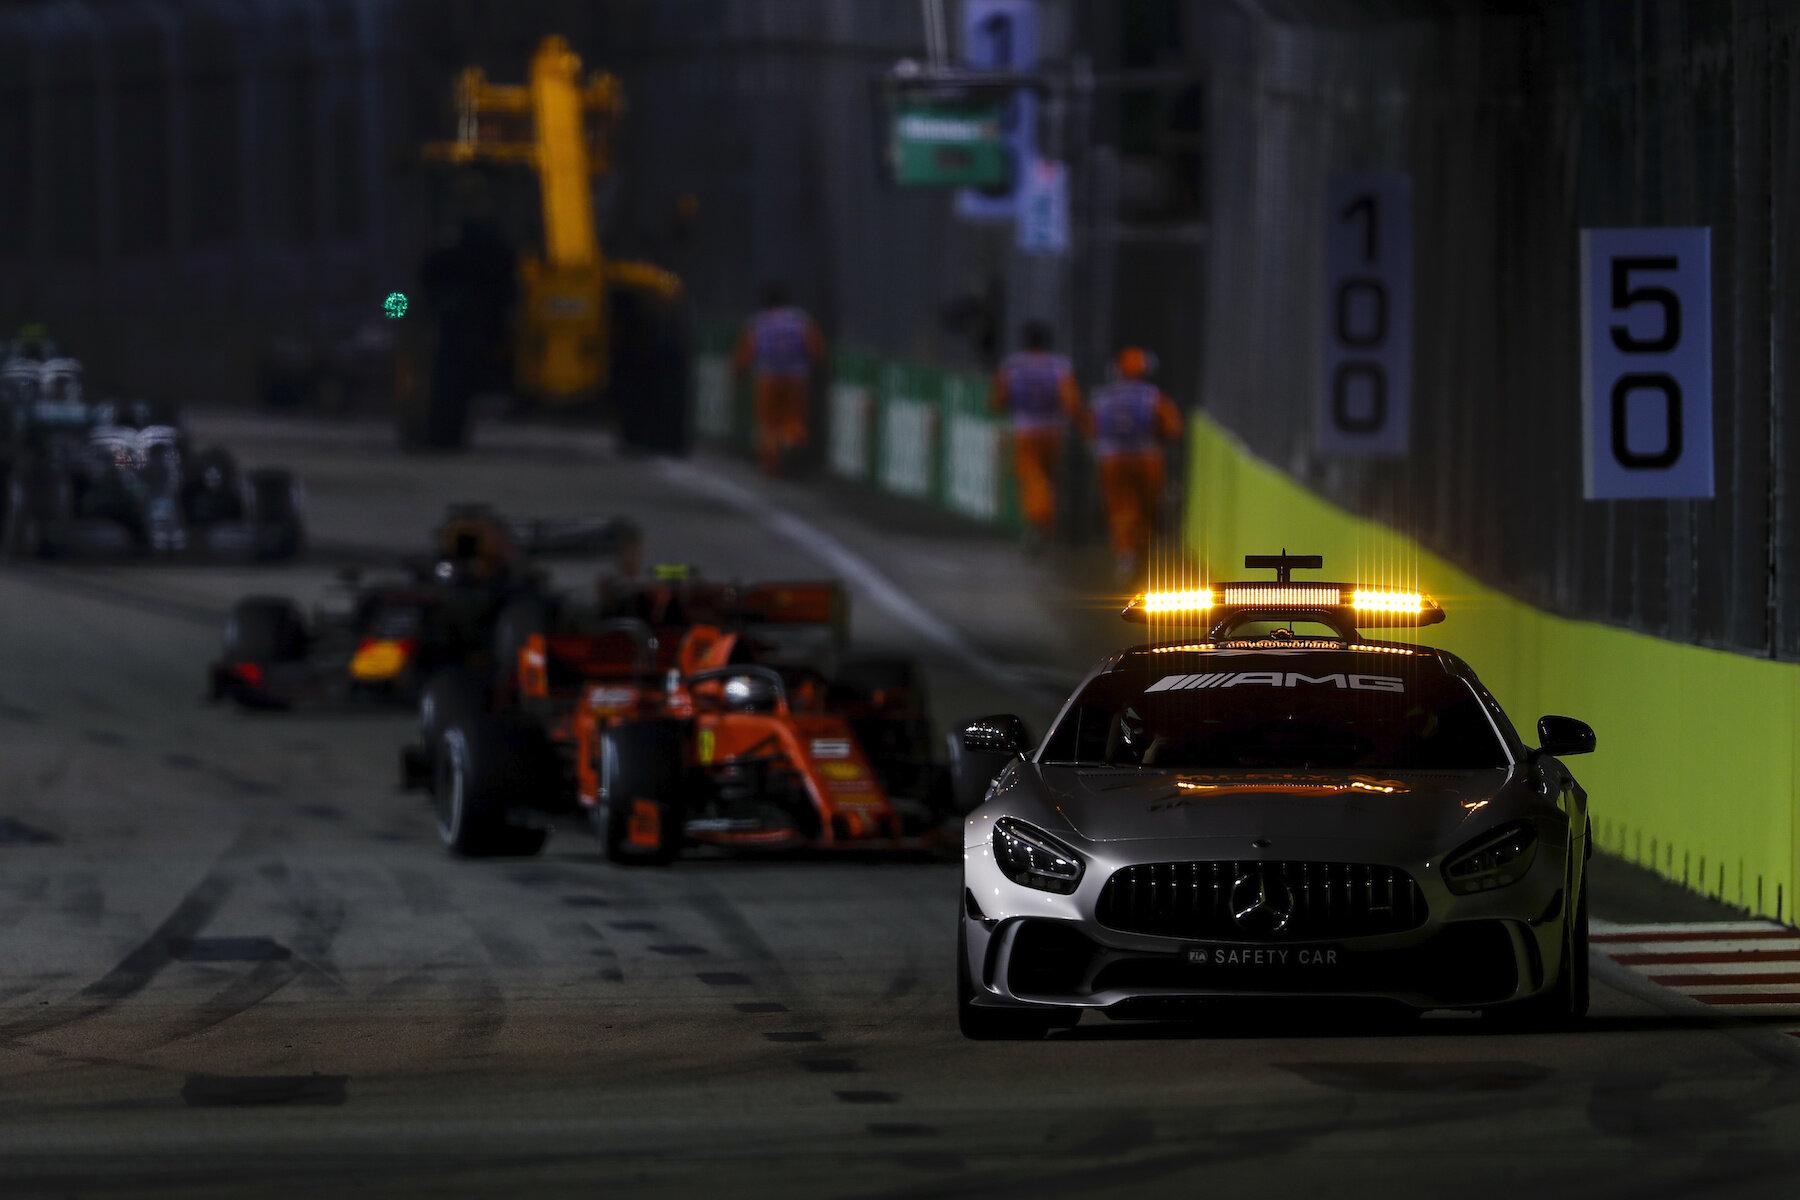 5 2019 Singapore GP Sunday 20.jpeg